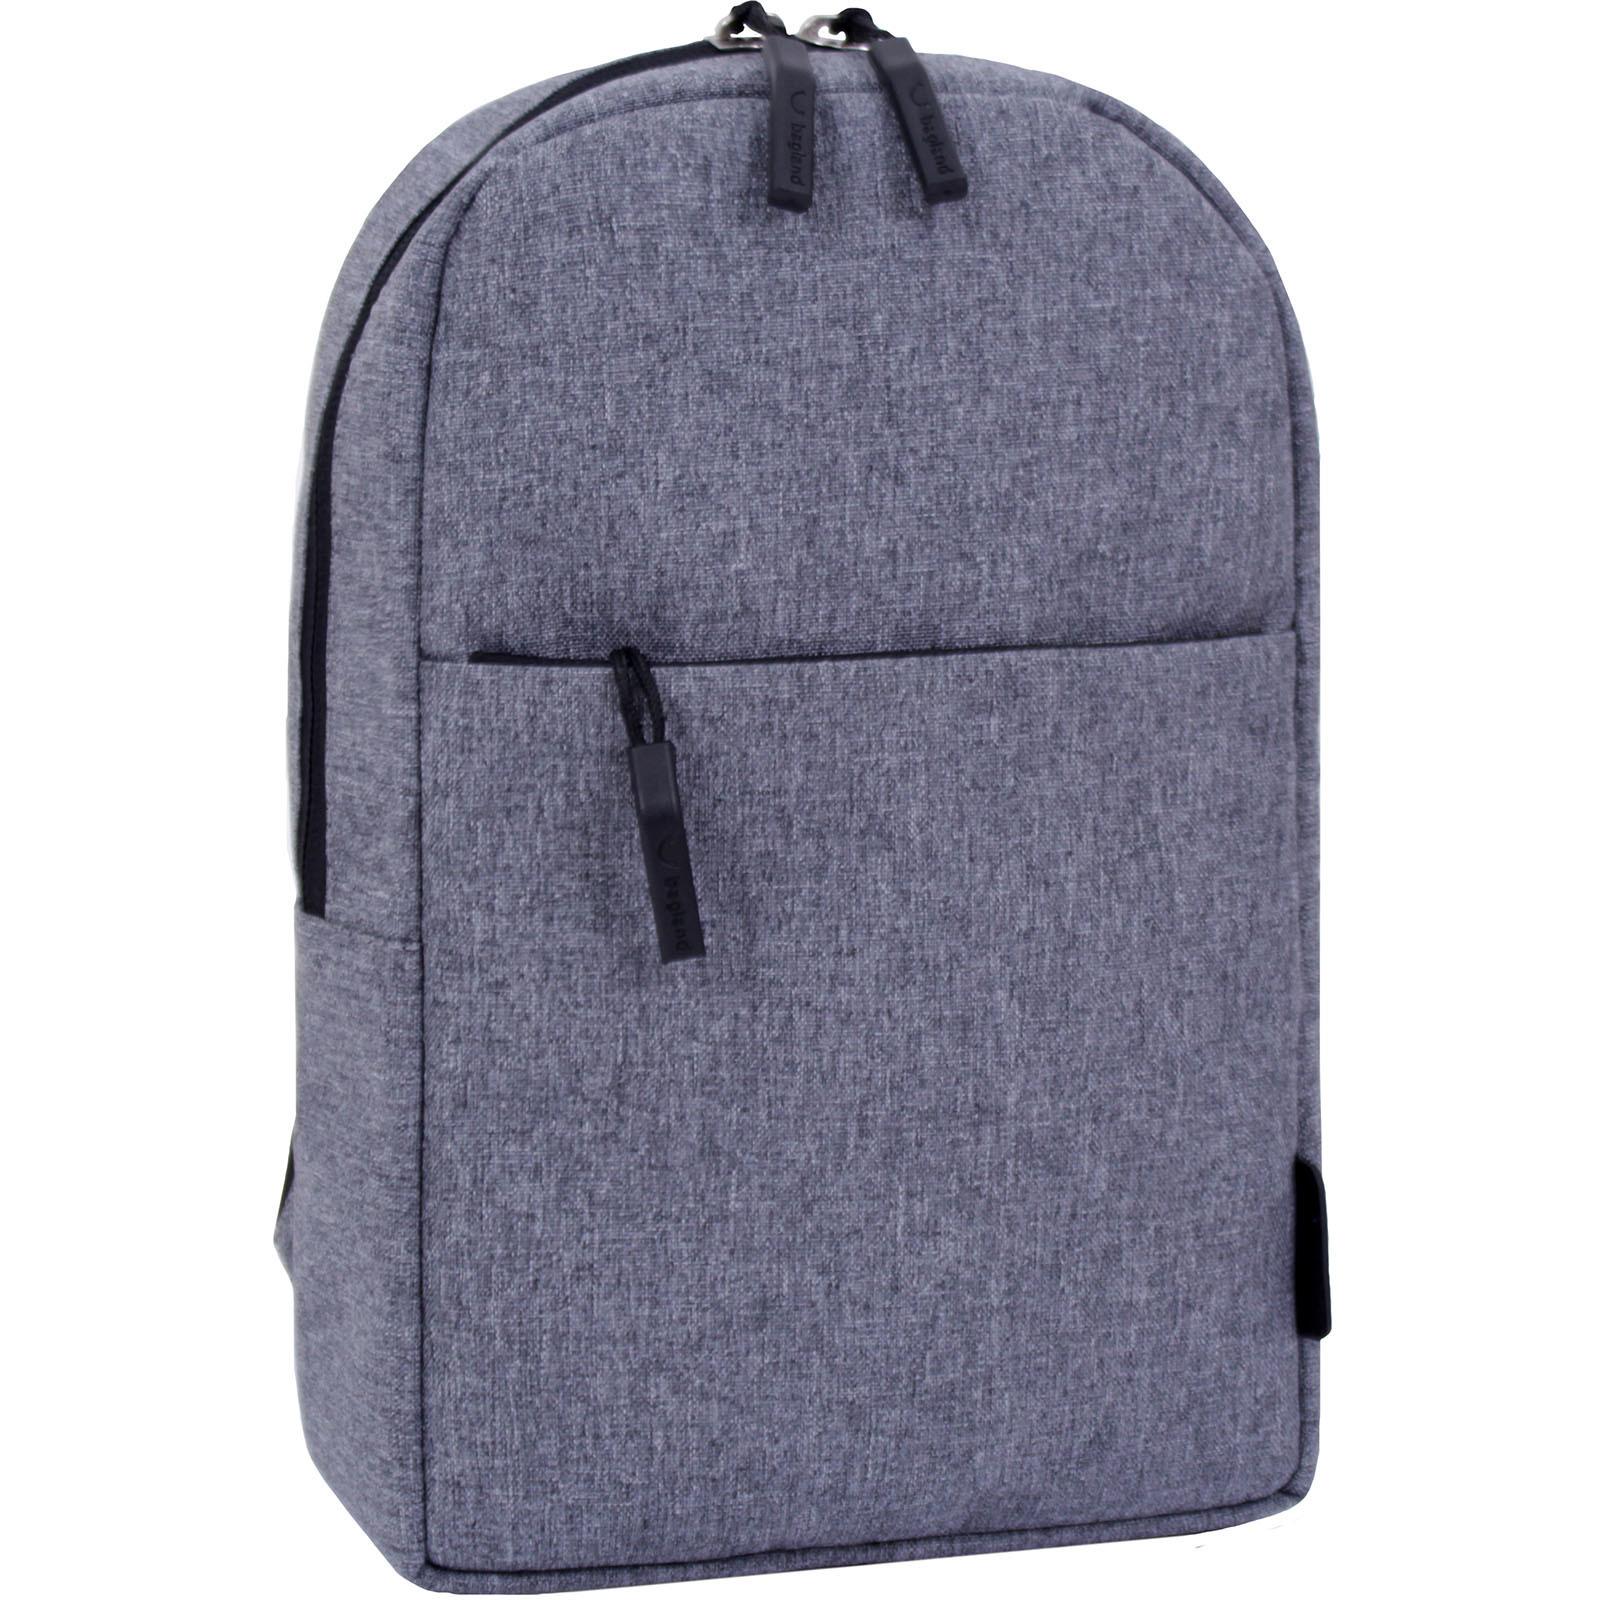 Маленькие рюкзаки Рюкзак Bagland Kidney 3 л. серый (0015169) IMG_3943.JPG